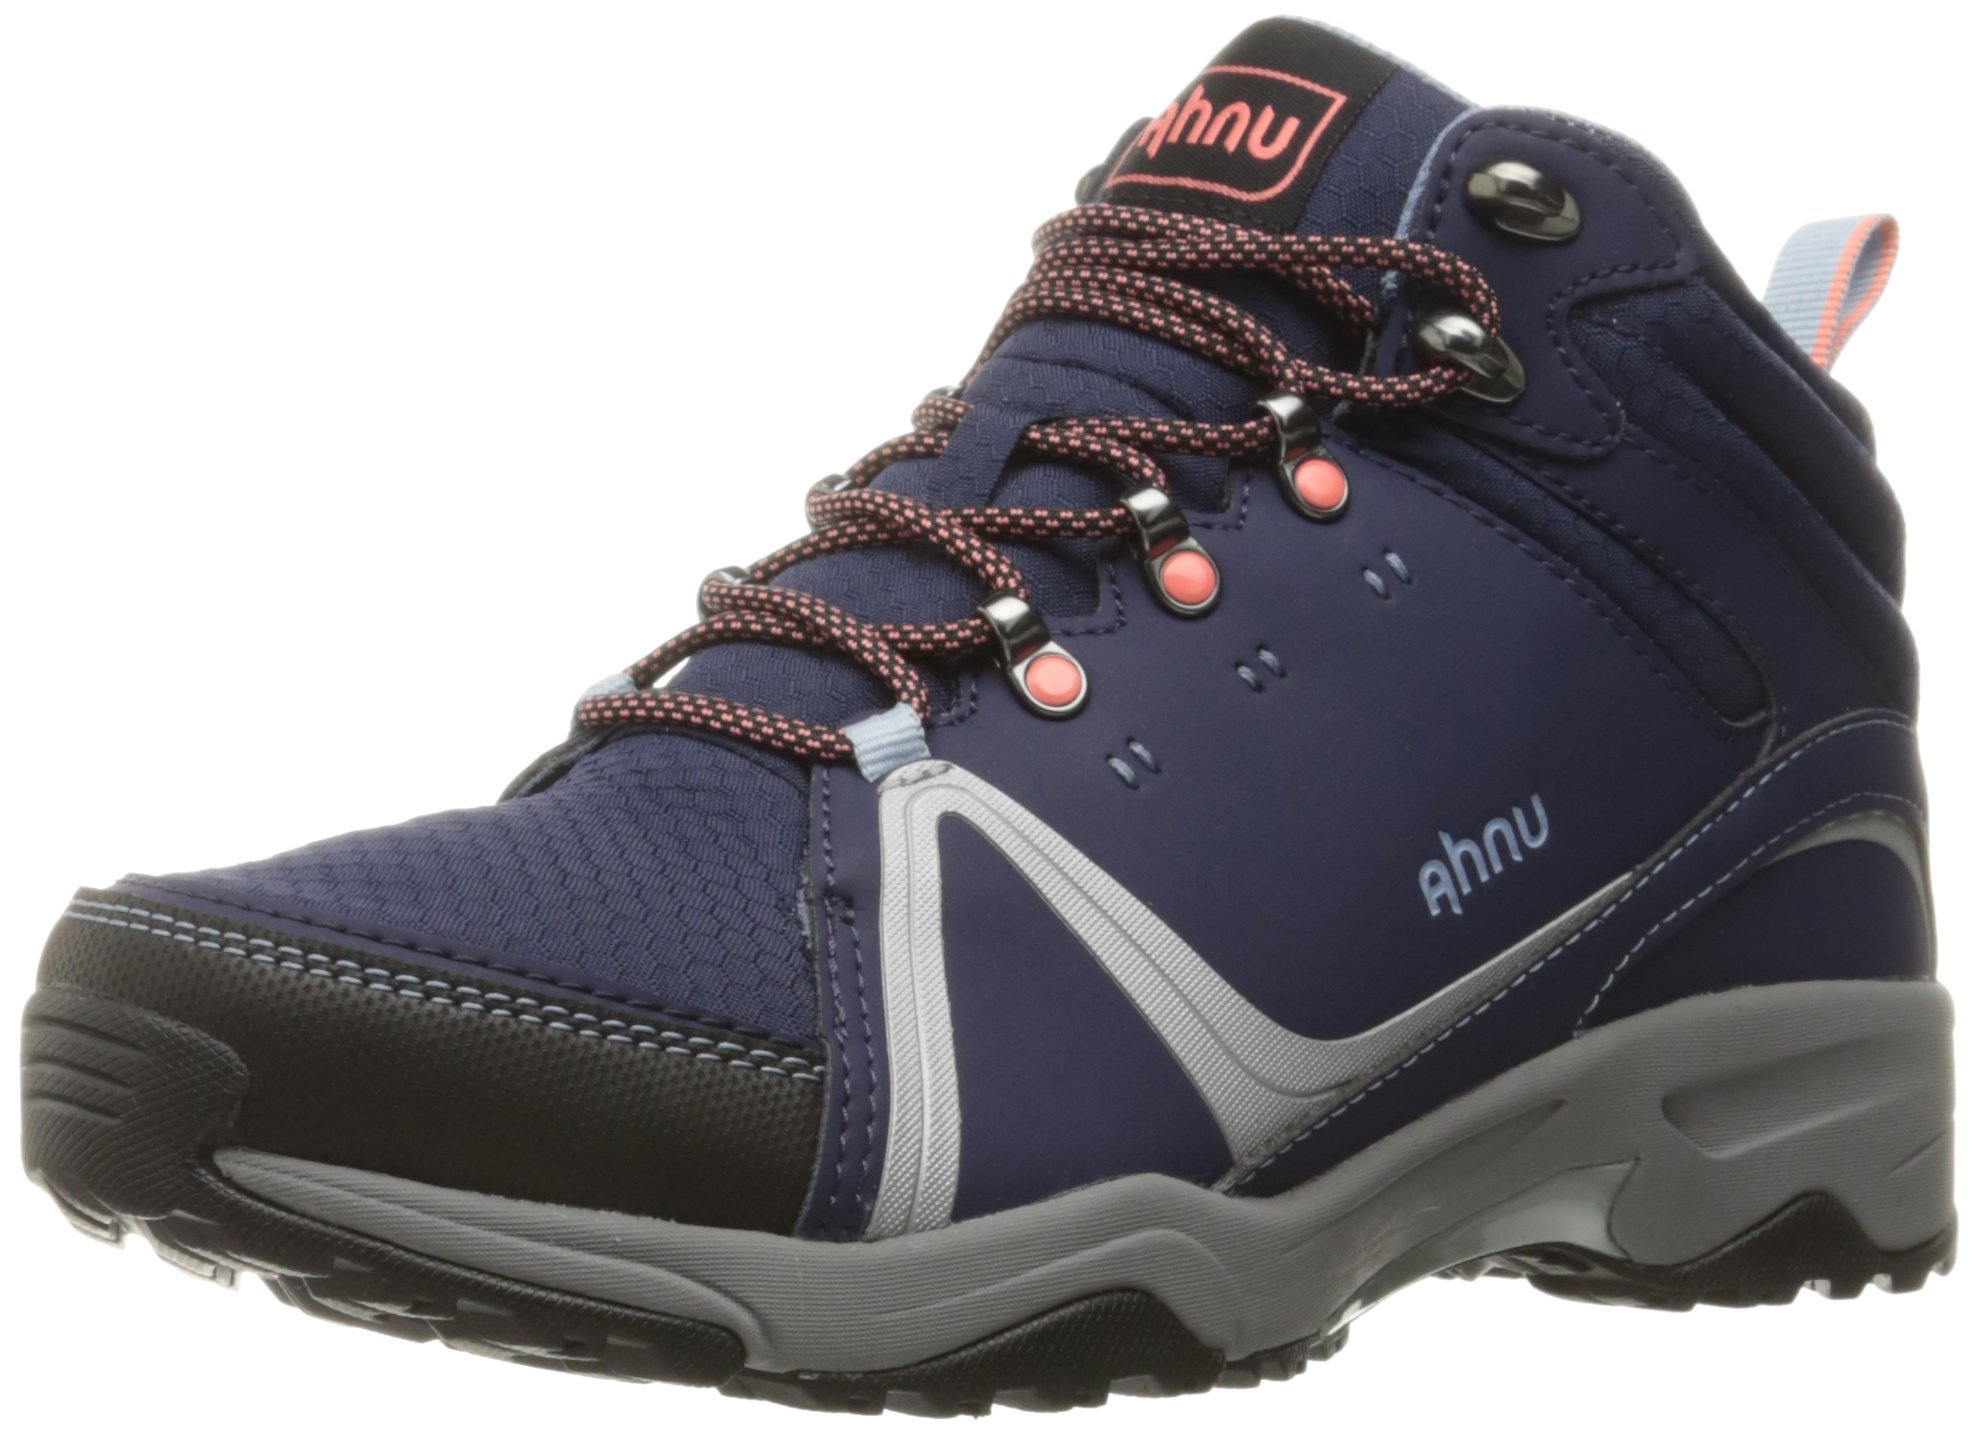 Ahnu Women's Alamere Mid Hiking Boot, Iris Shadow, 9.5 M US